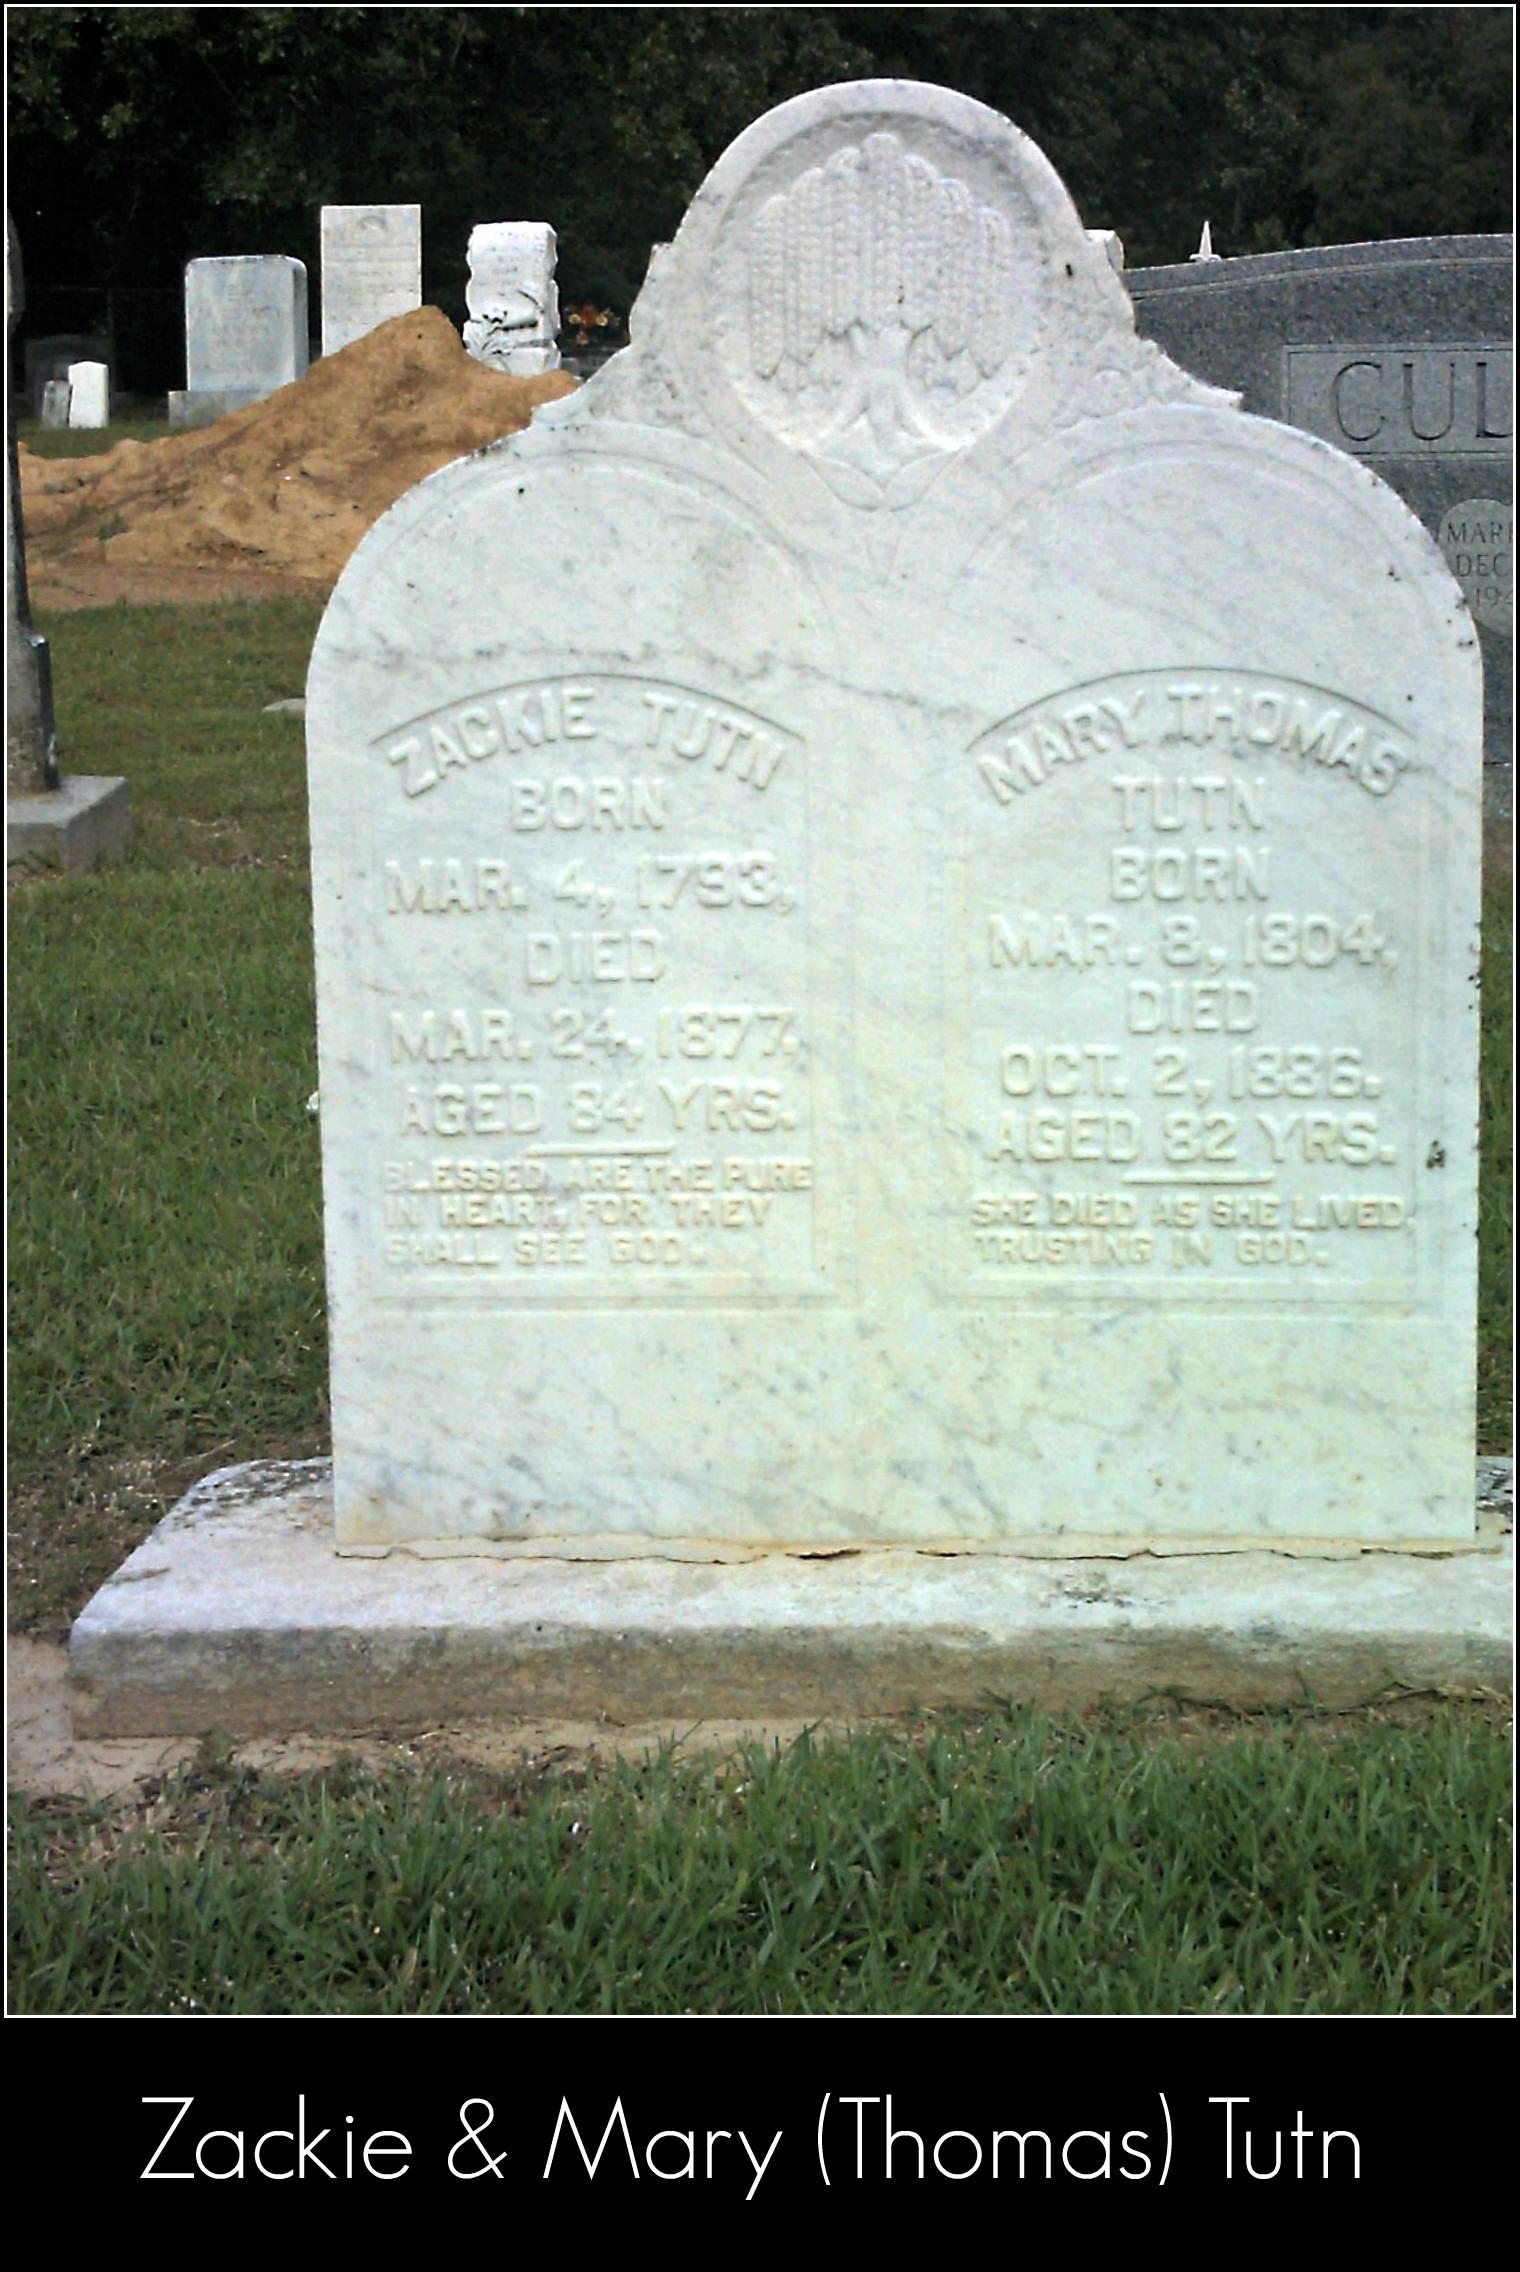 Mary Cushing Thomas